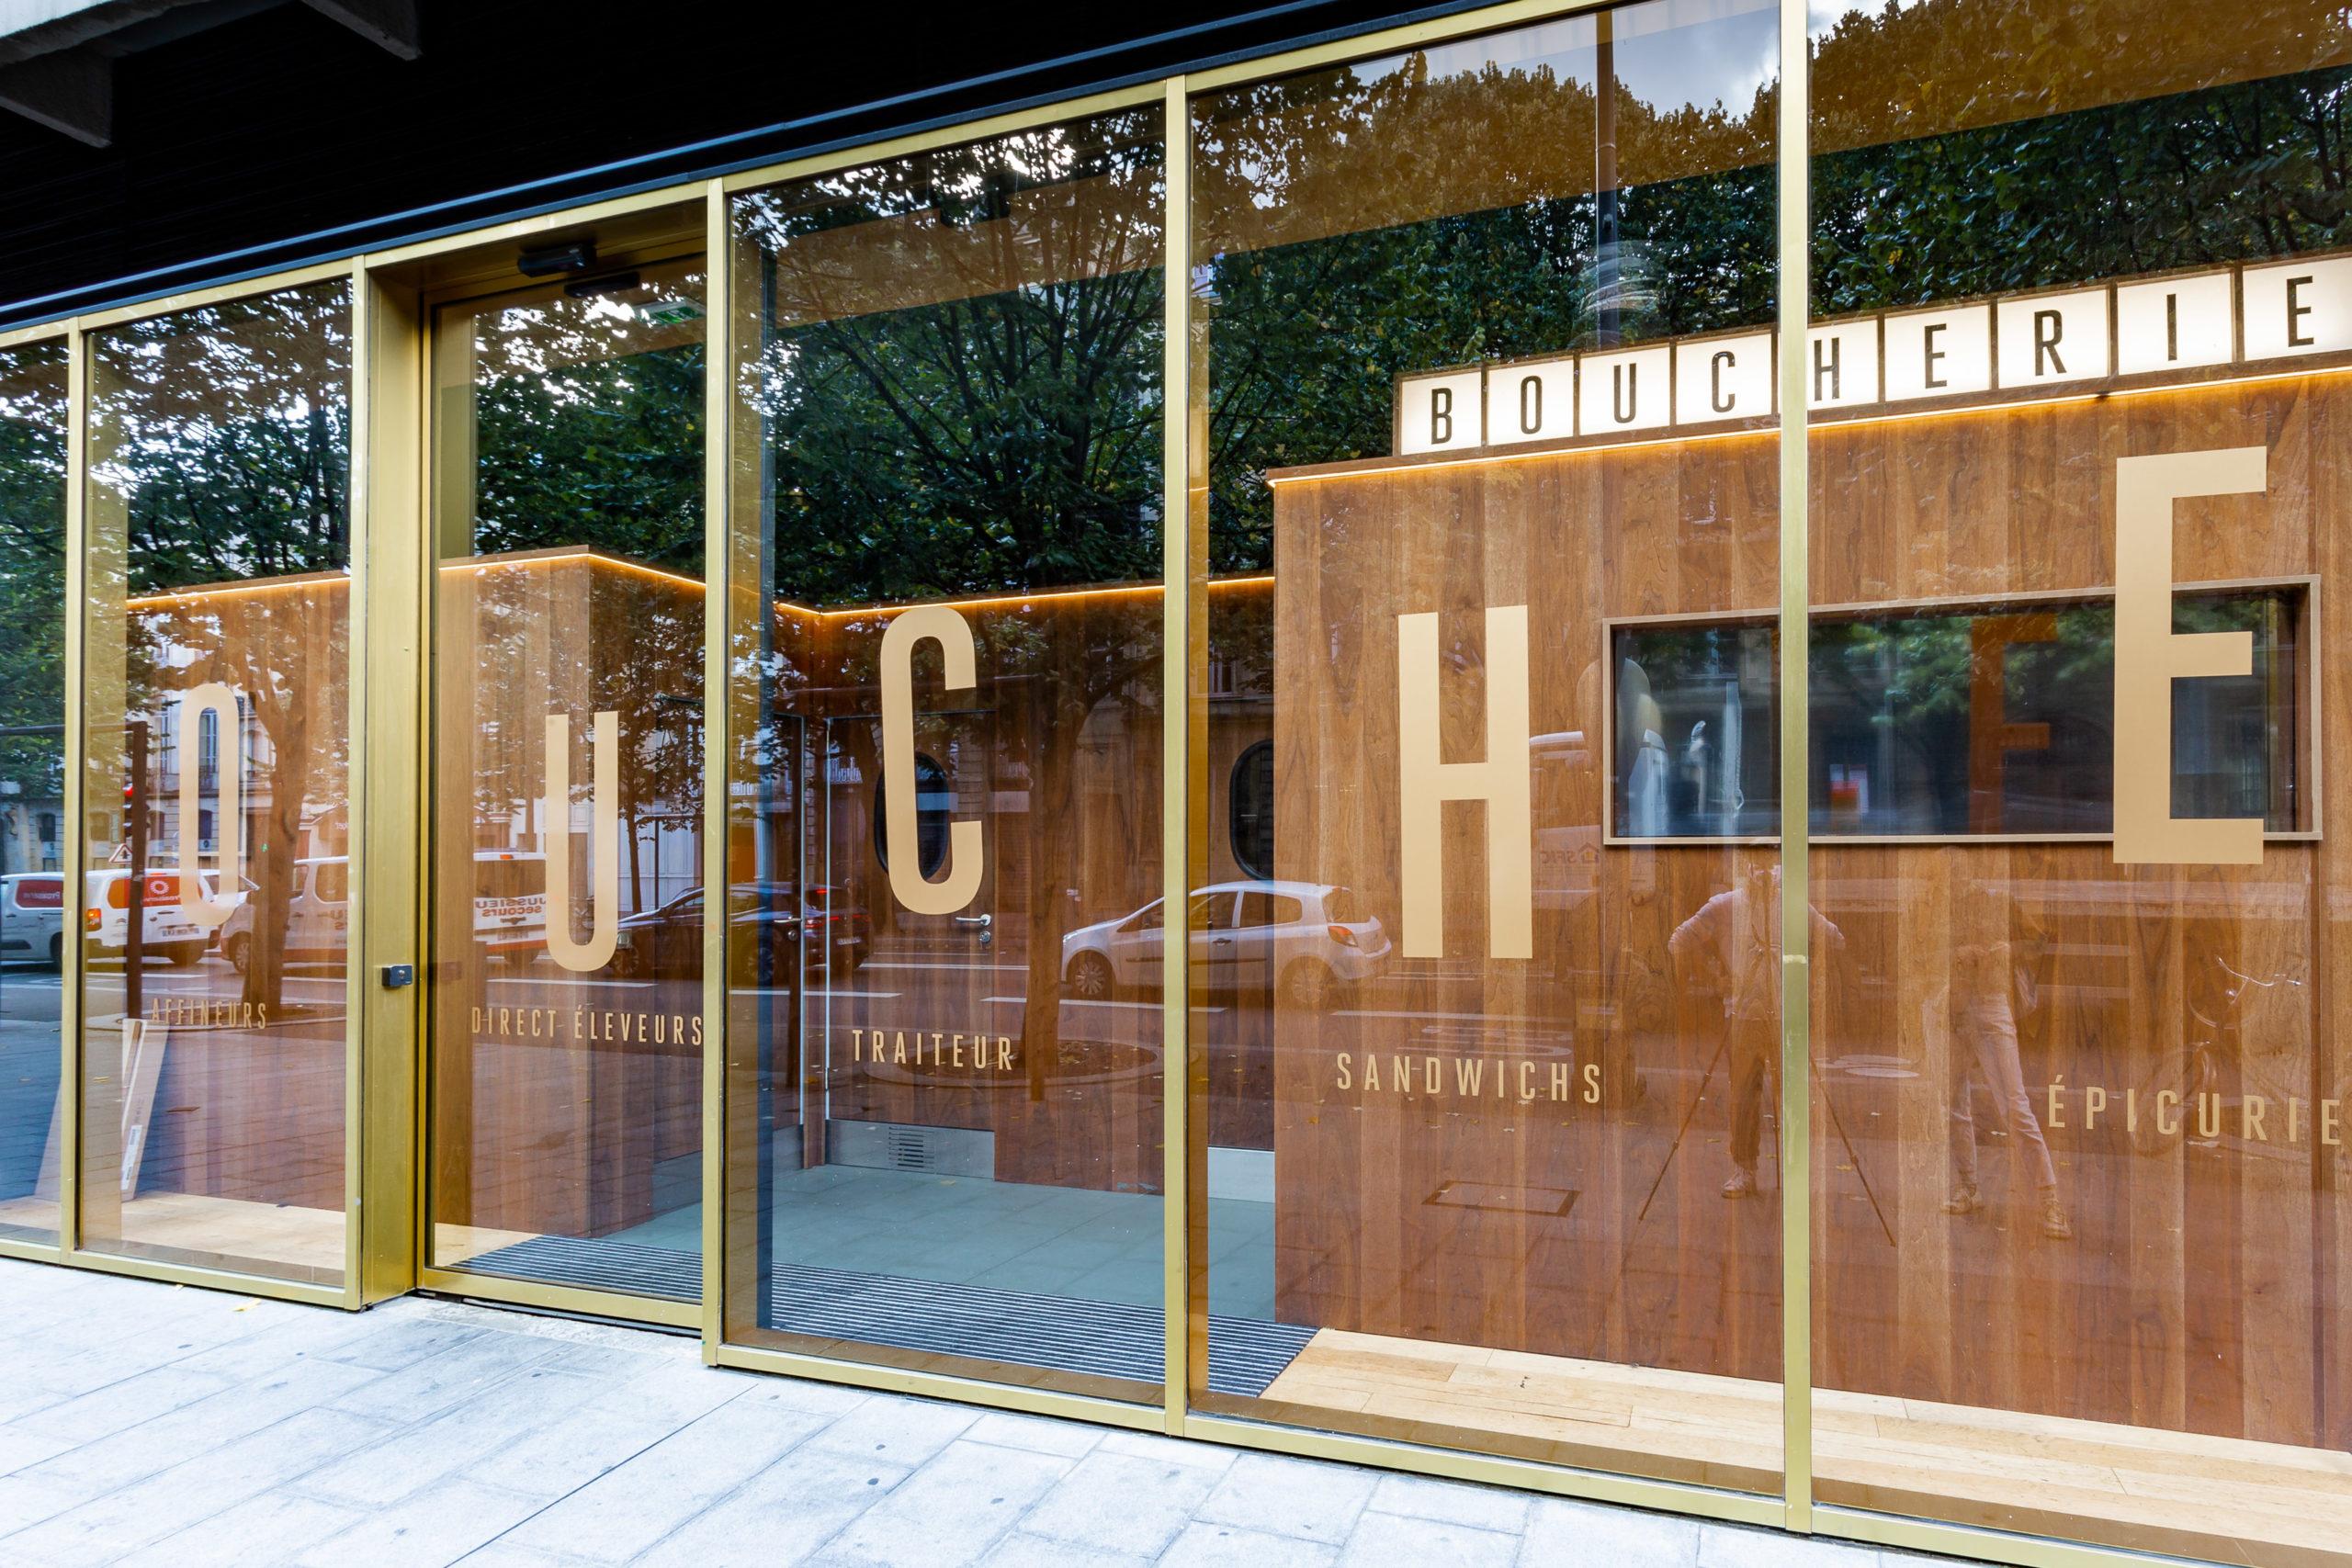 Bouche architecture_Thomas_Dircks _F-1